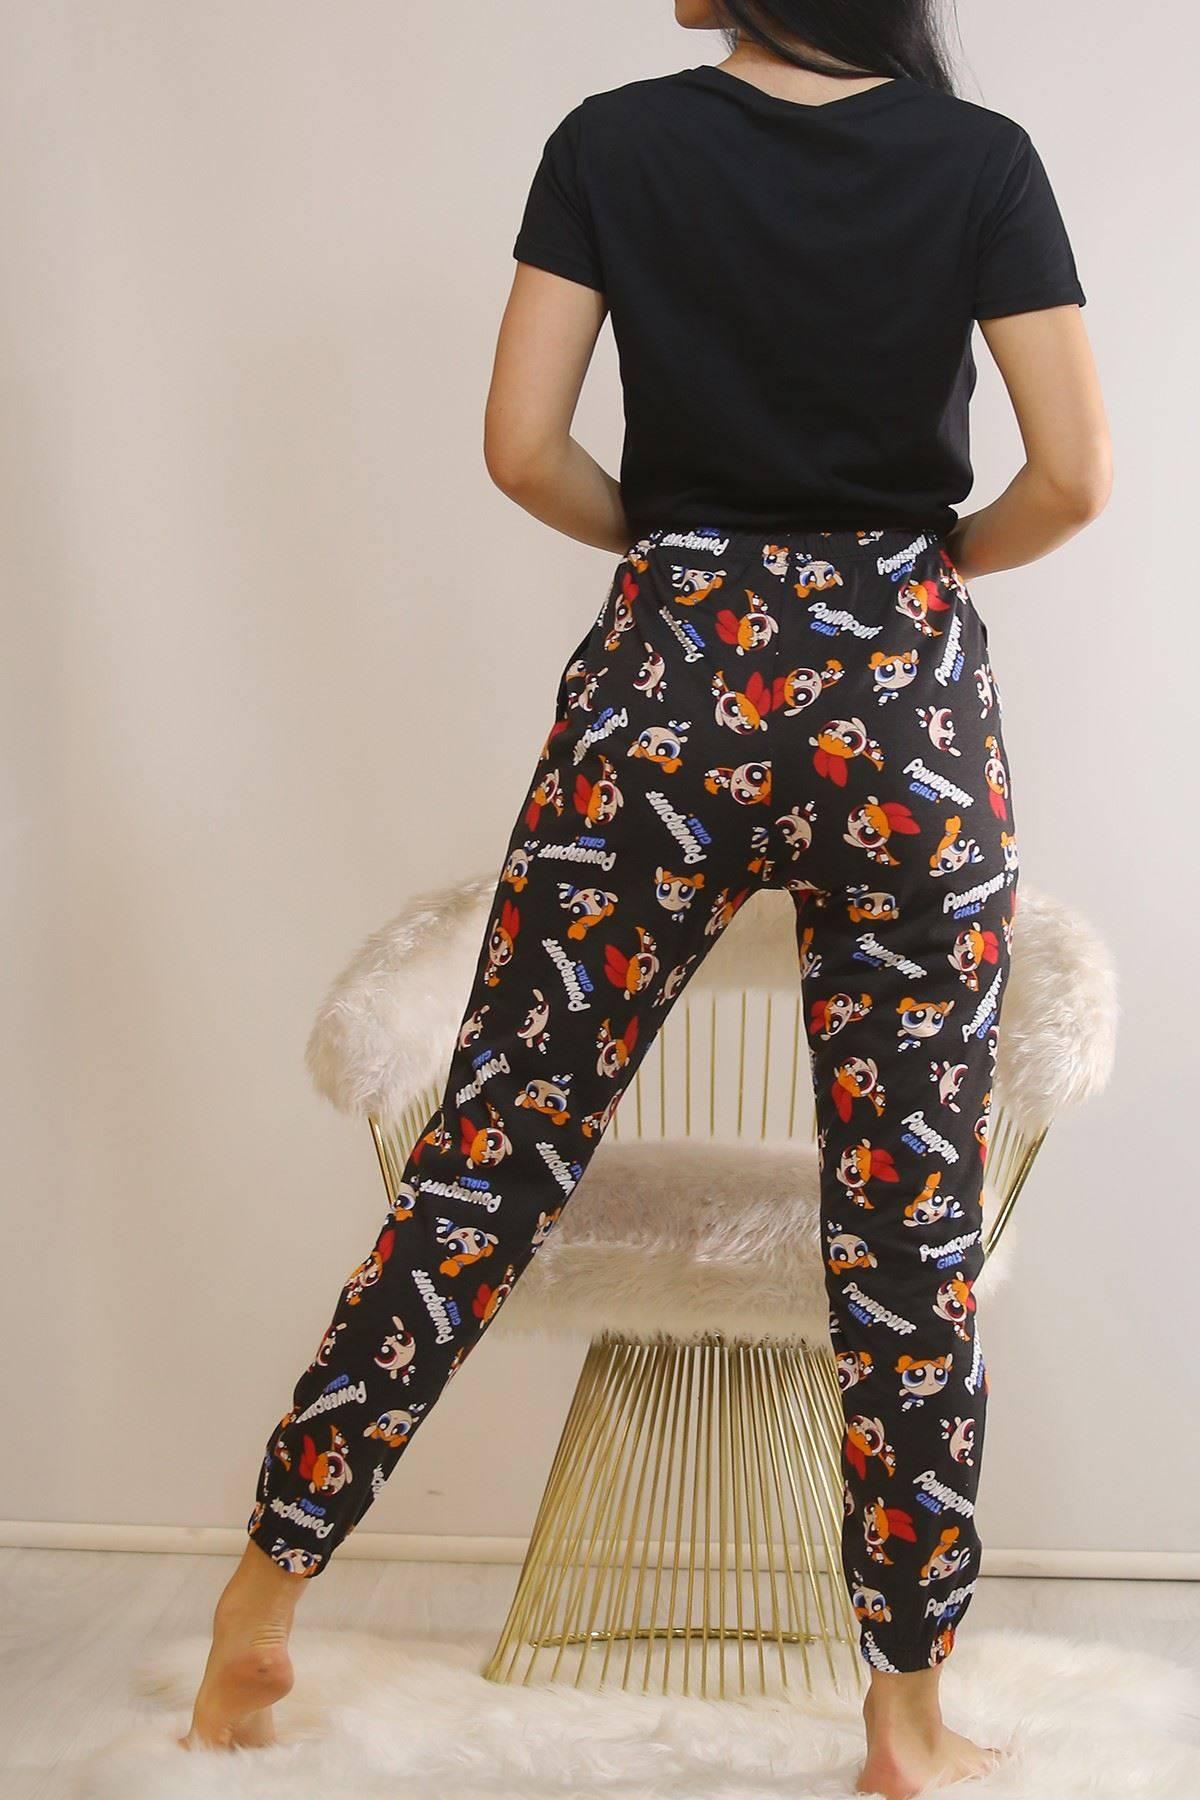 Bağlamalı Pijama Takımı Siyah2 - 5991.1059.